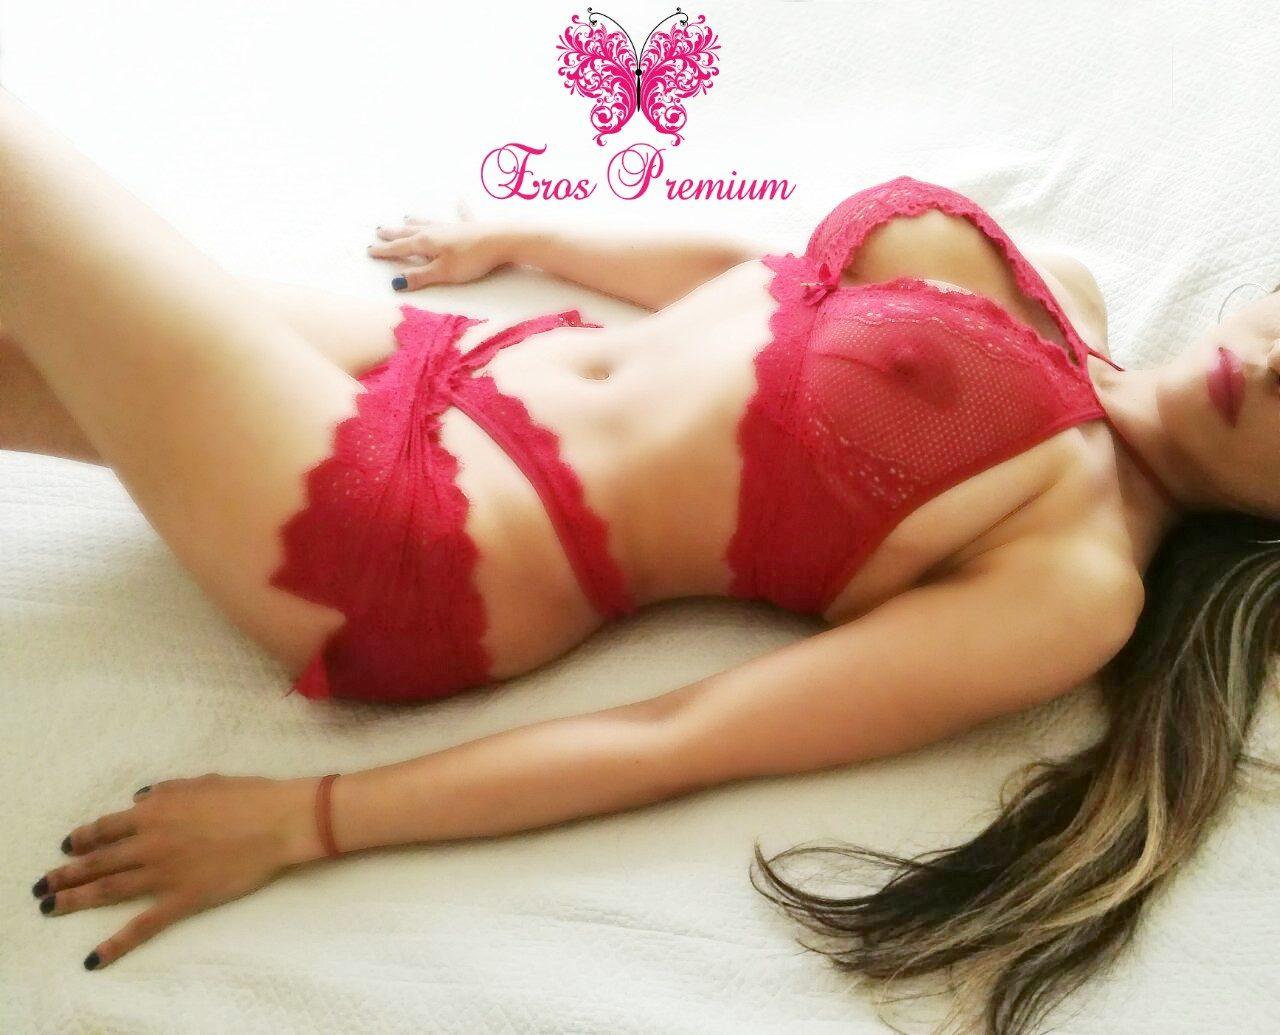 Viviana Prepago Bogotá Eros Premium 3